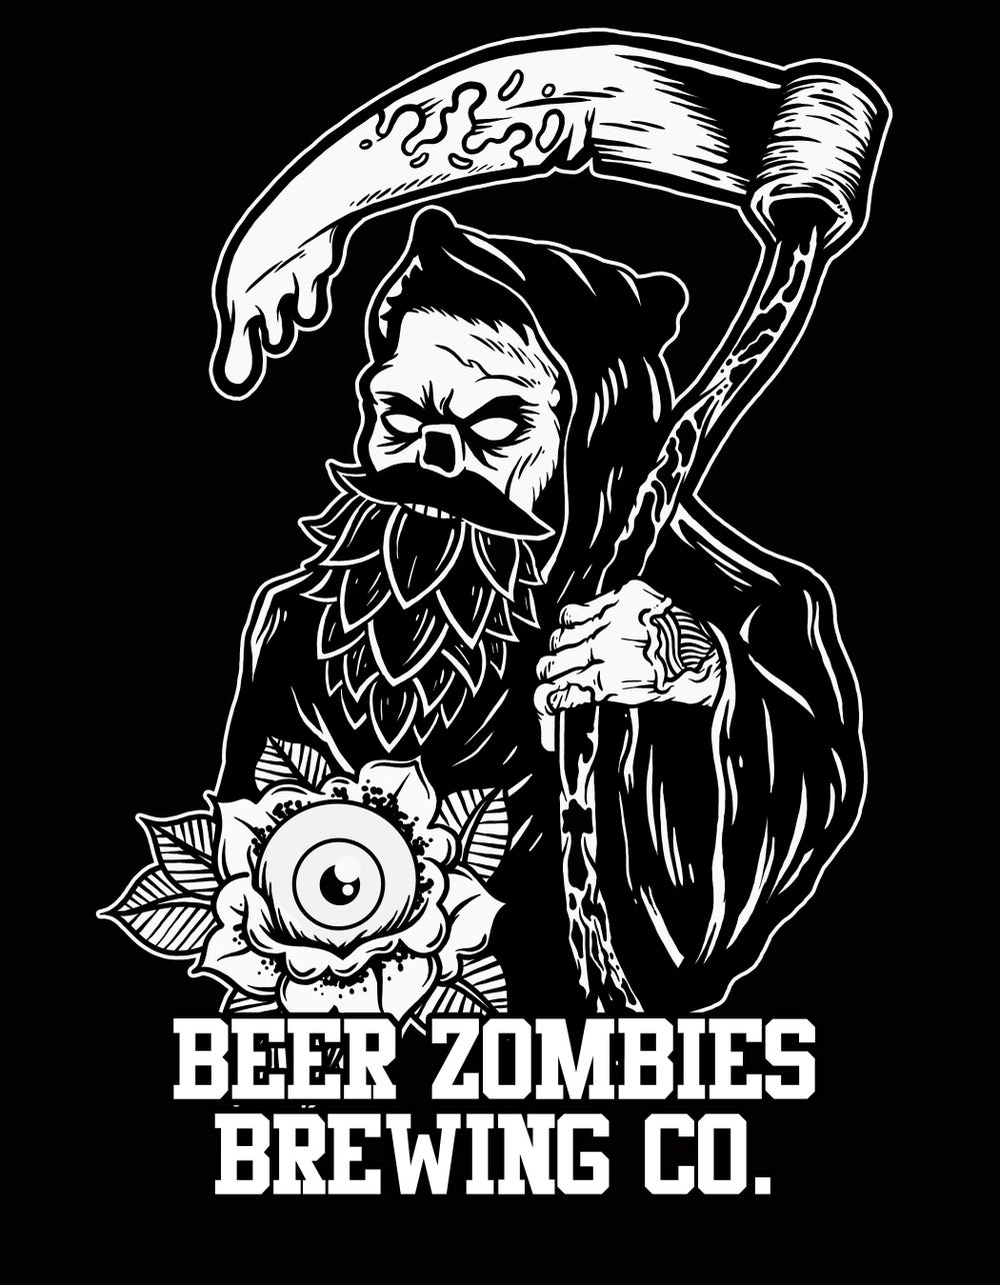 Beer Zombies - Beer Zombies Brewing Co. Shirt